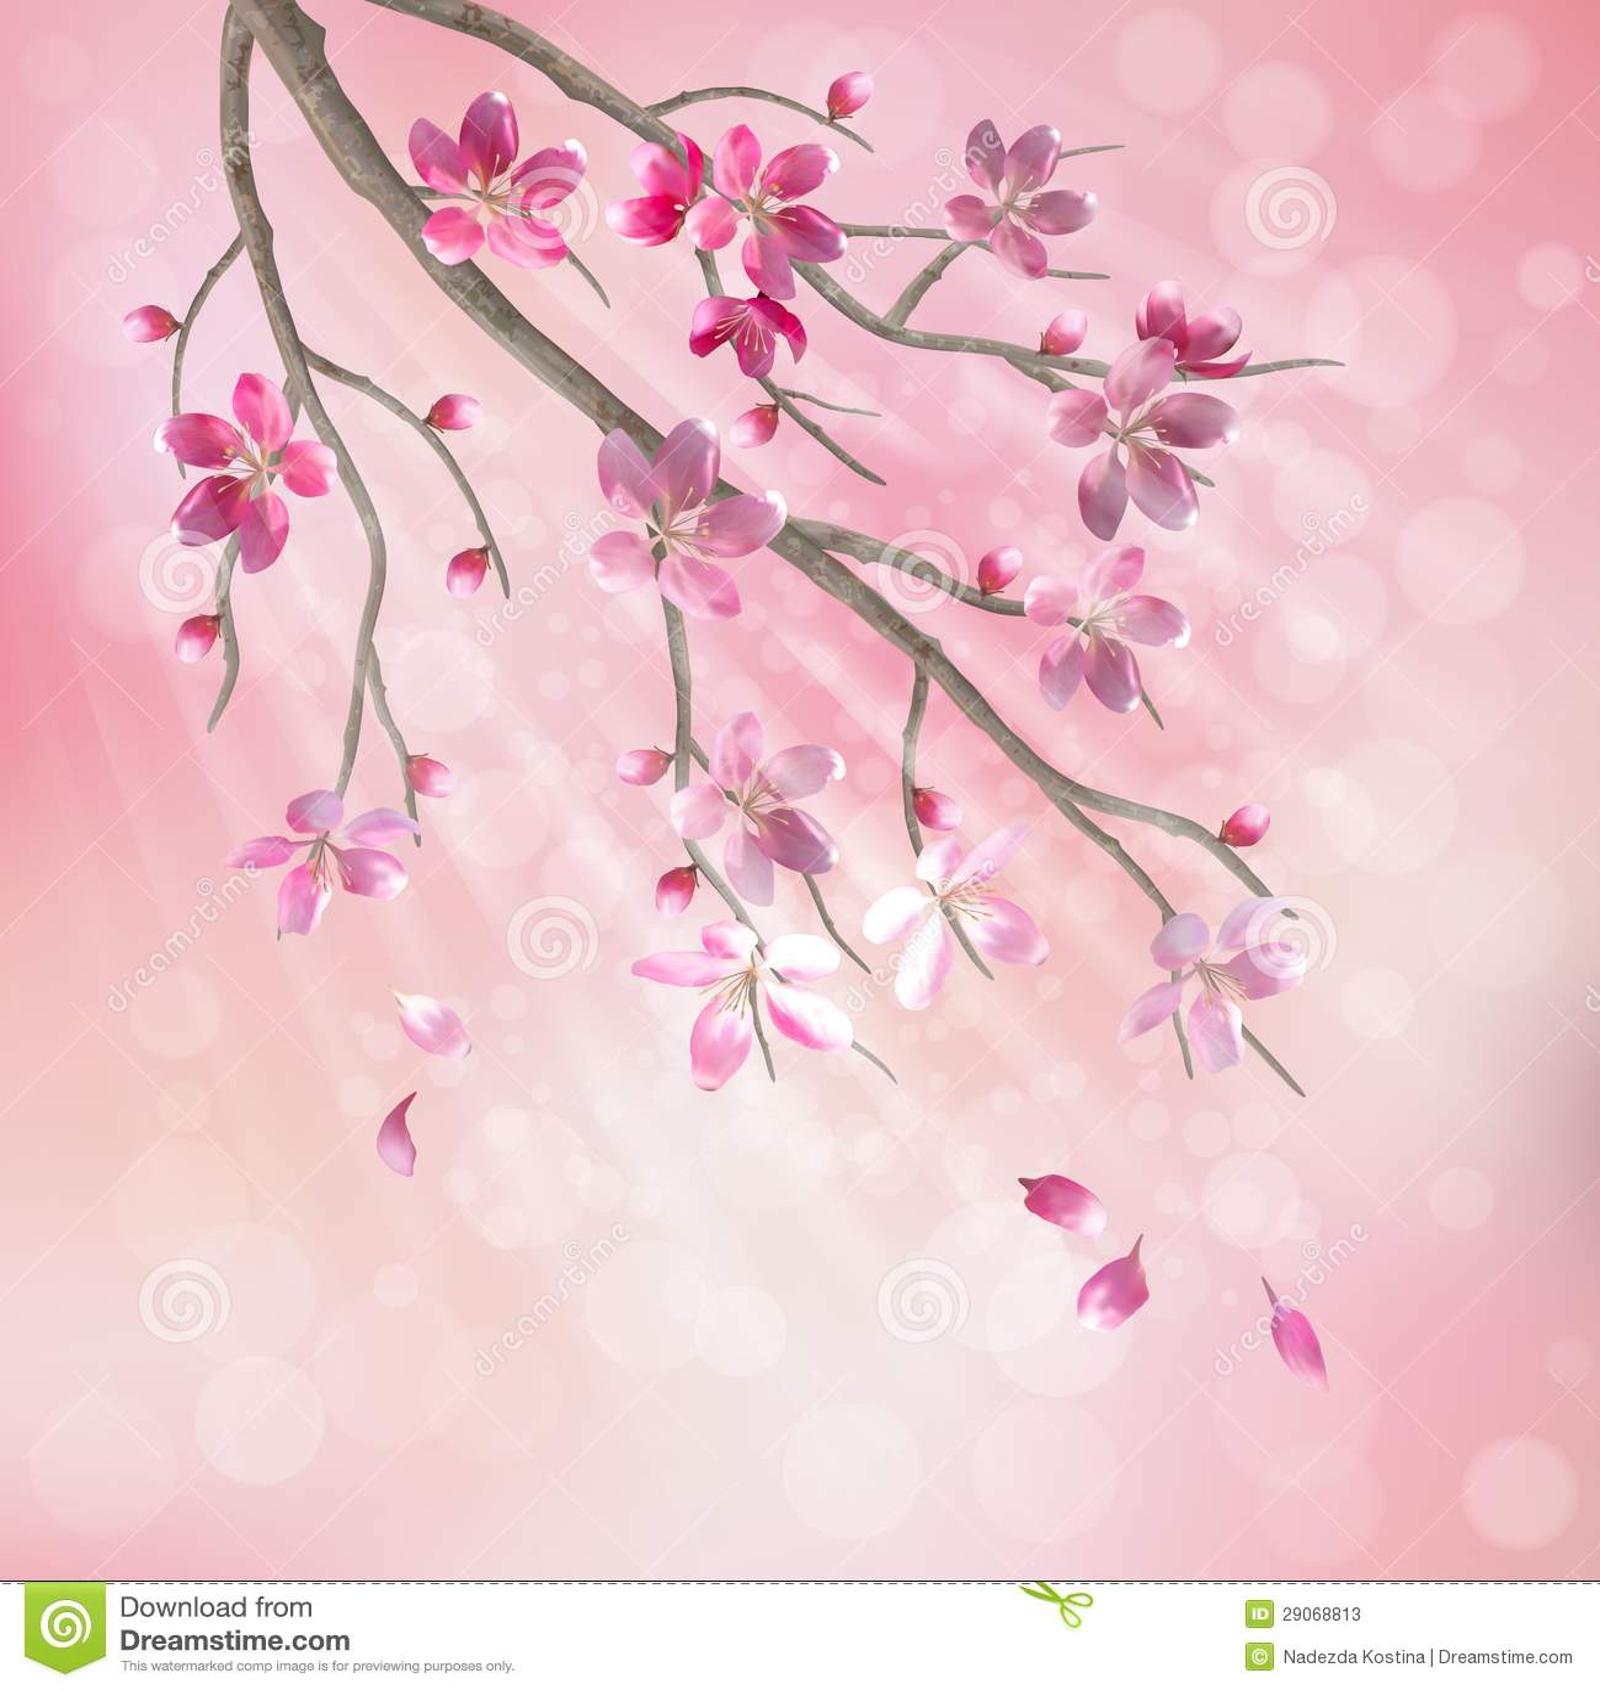 Falling Cherry Blossom Wallpaper Hd Spring Vector Tree Branch Cherry Blossom Flowers Stock